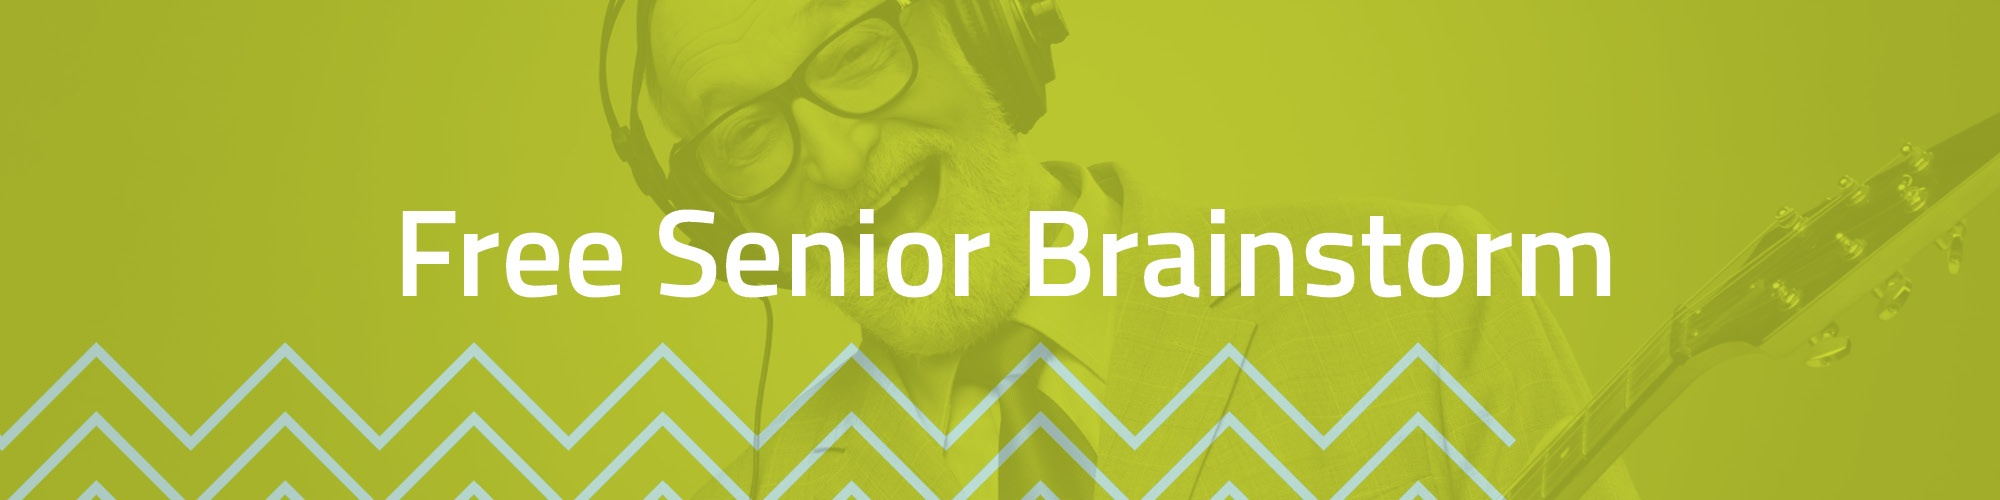 Imagewerks Marketing Senior Living Free Brainstorm